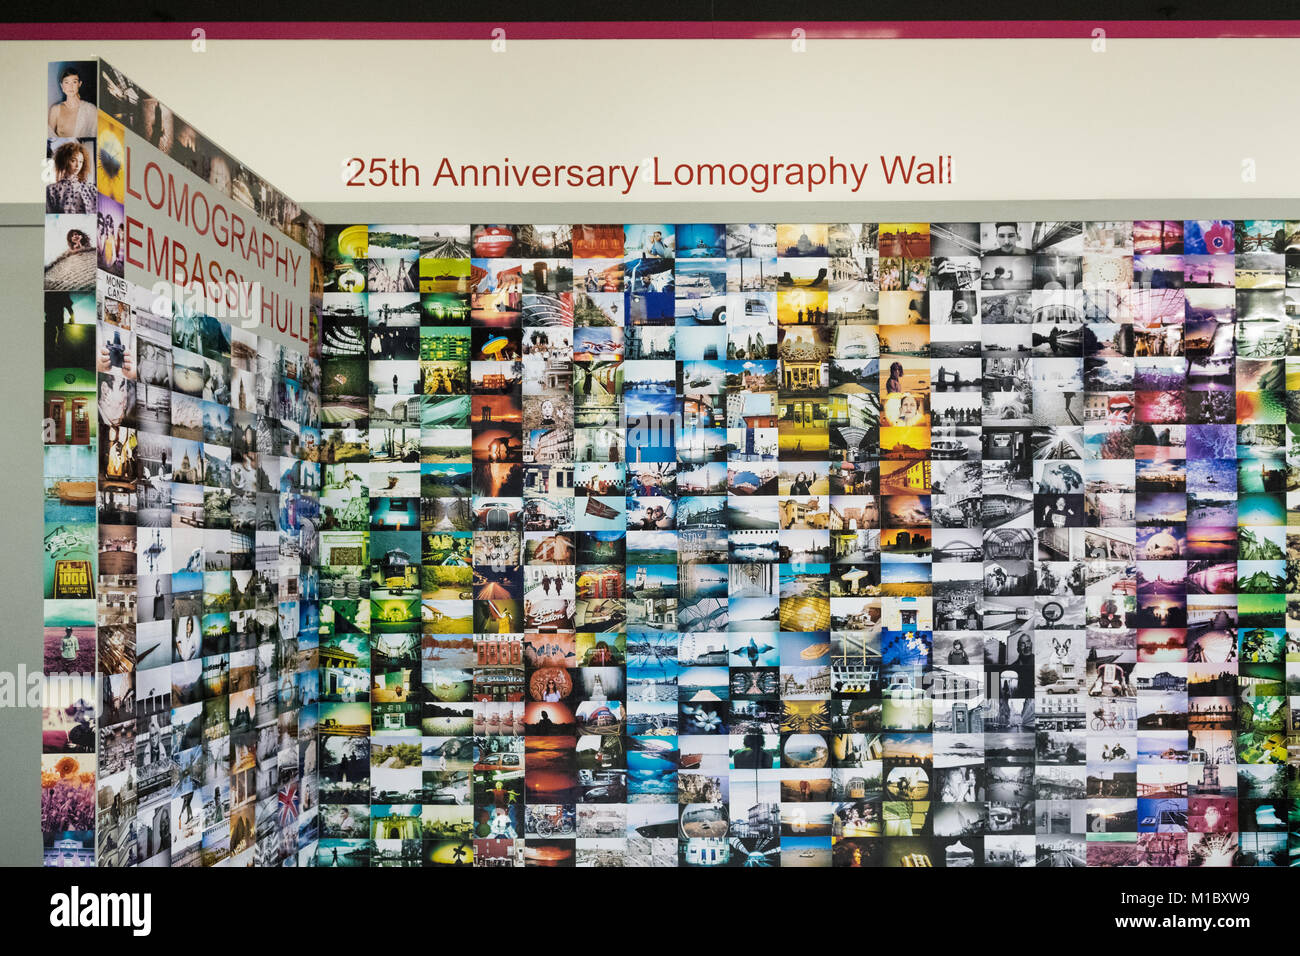 25th Anniversary Lomography wall at the Lomography Embassy, Hull, England, UK - Stock Image